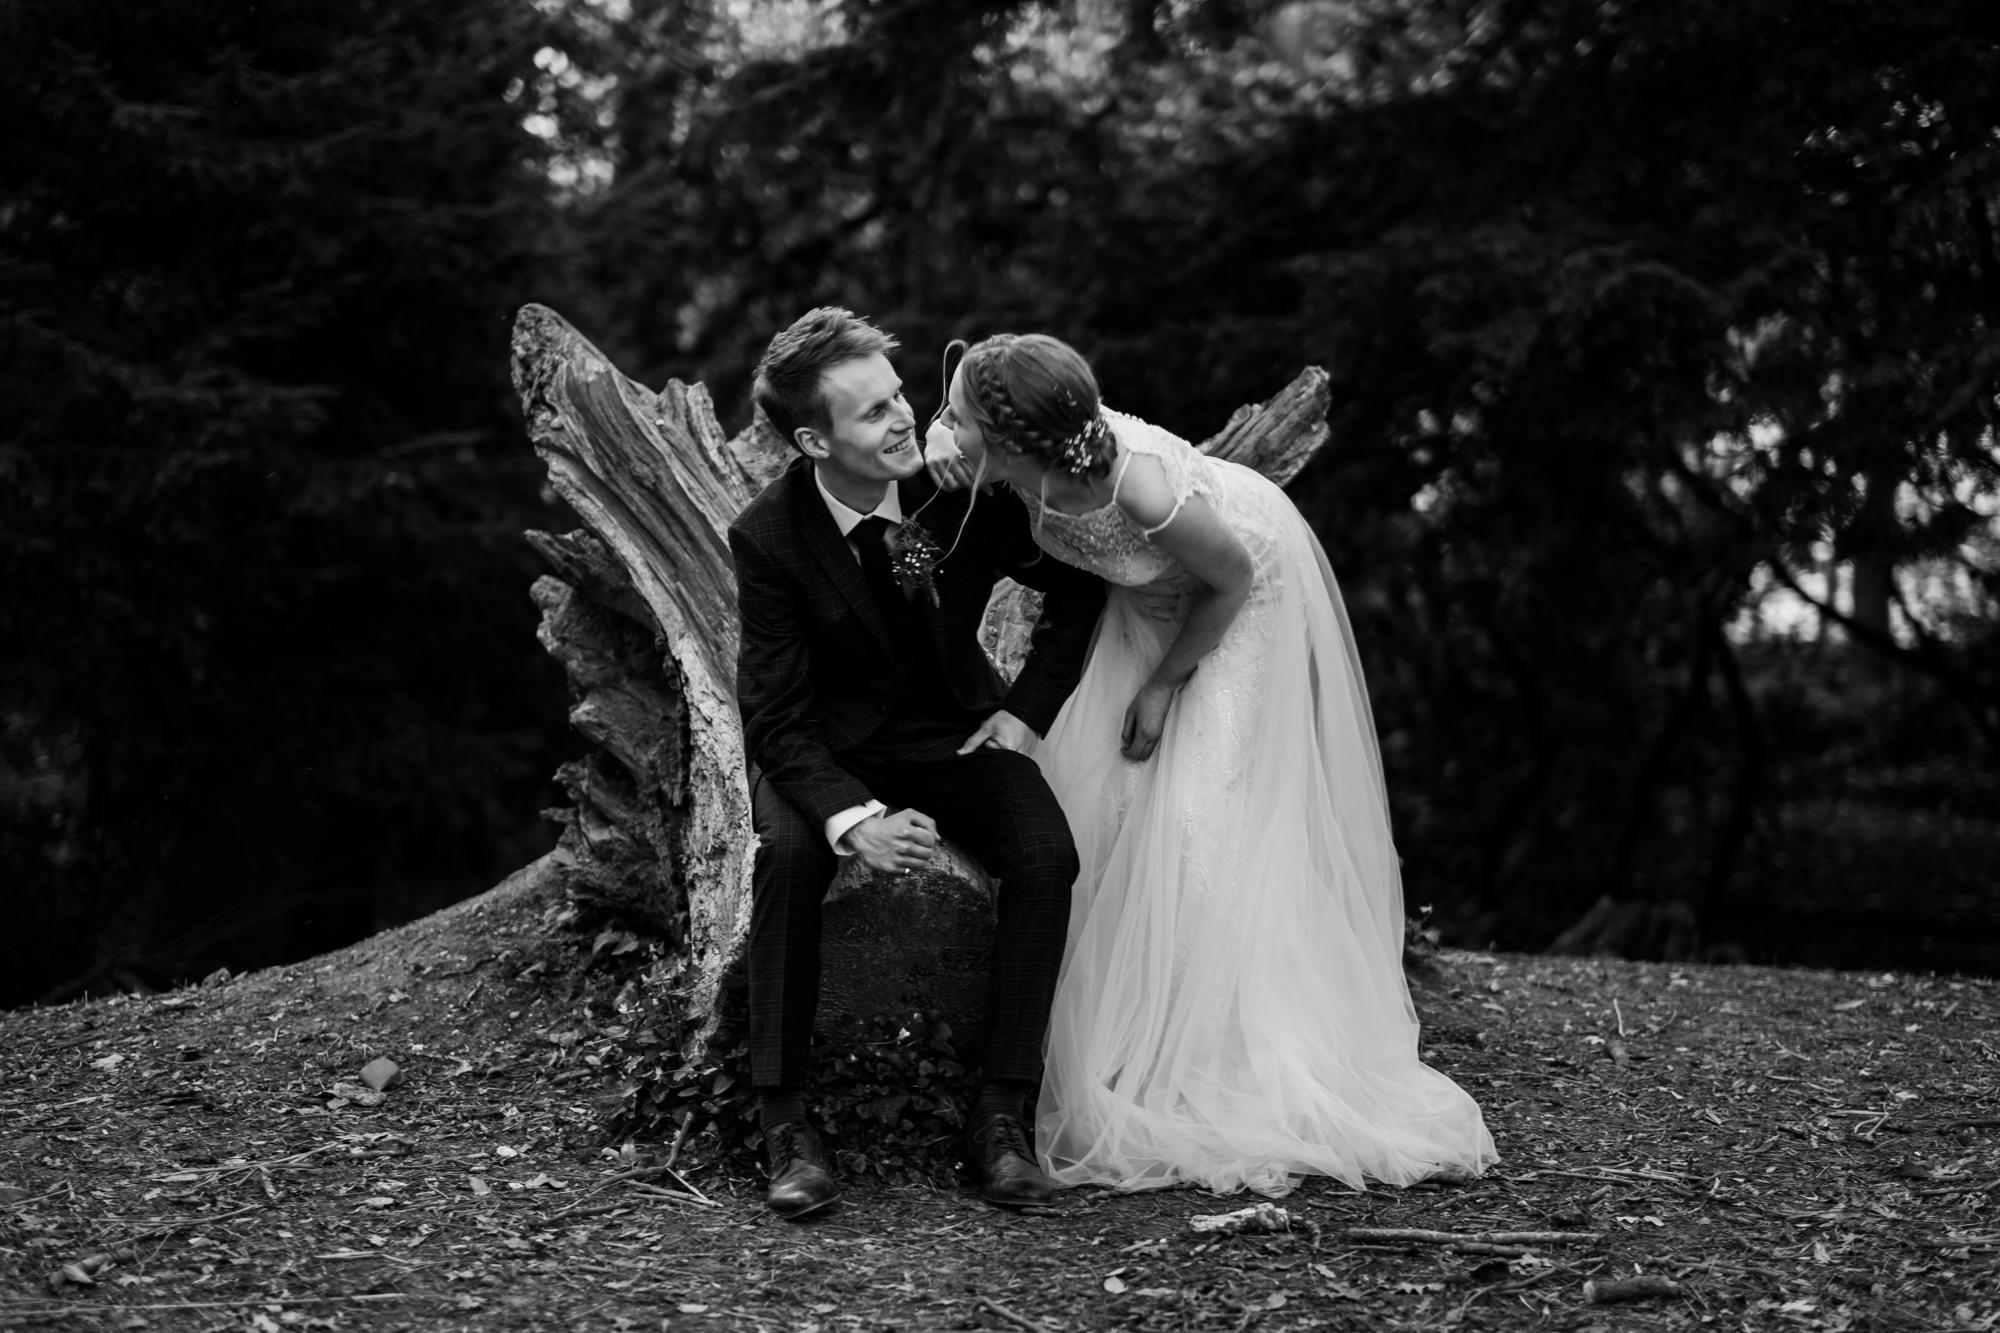 Katie and Dode weddings (179 of 207).jpg